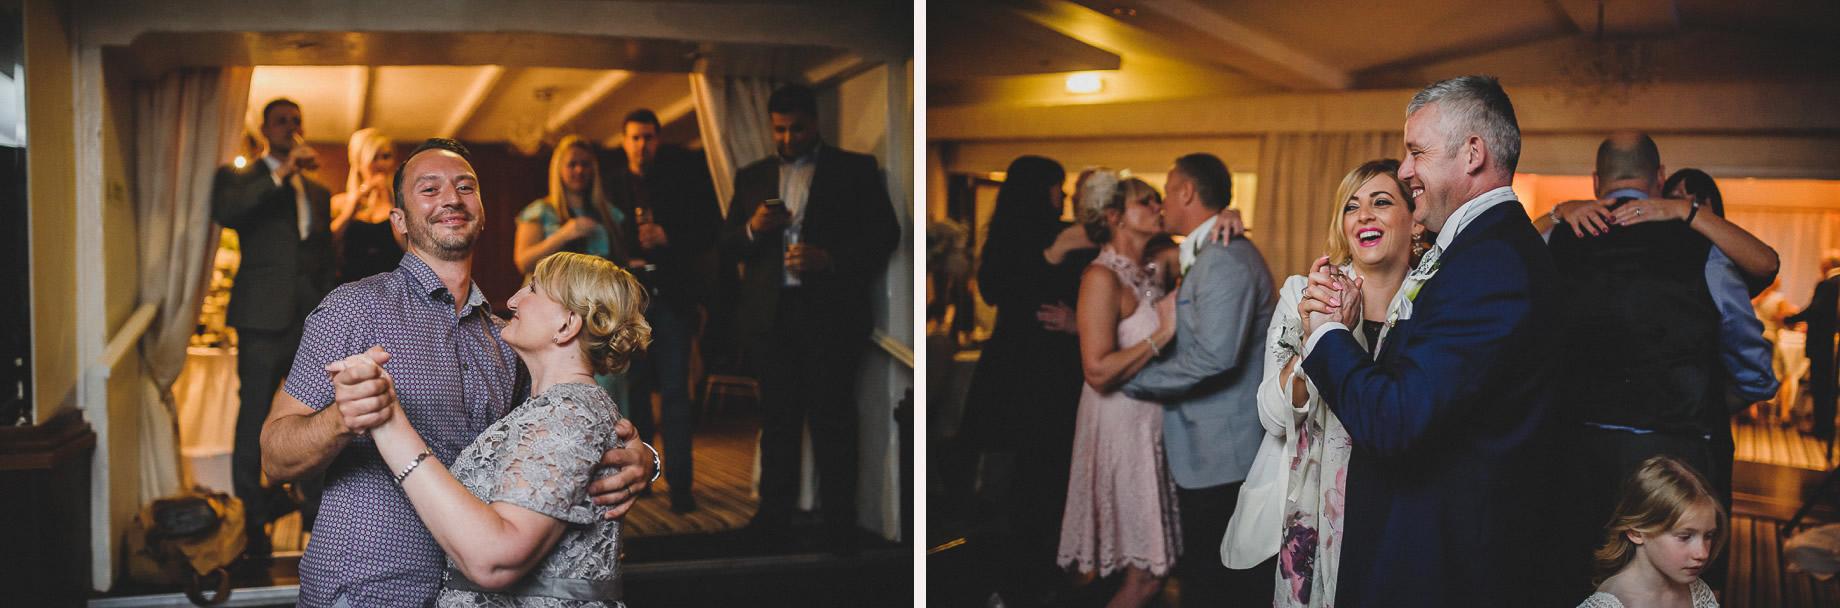 Rachel and Christian's Wedding at Holland Hall Hotel 171